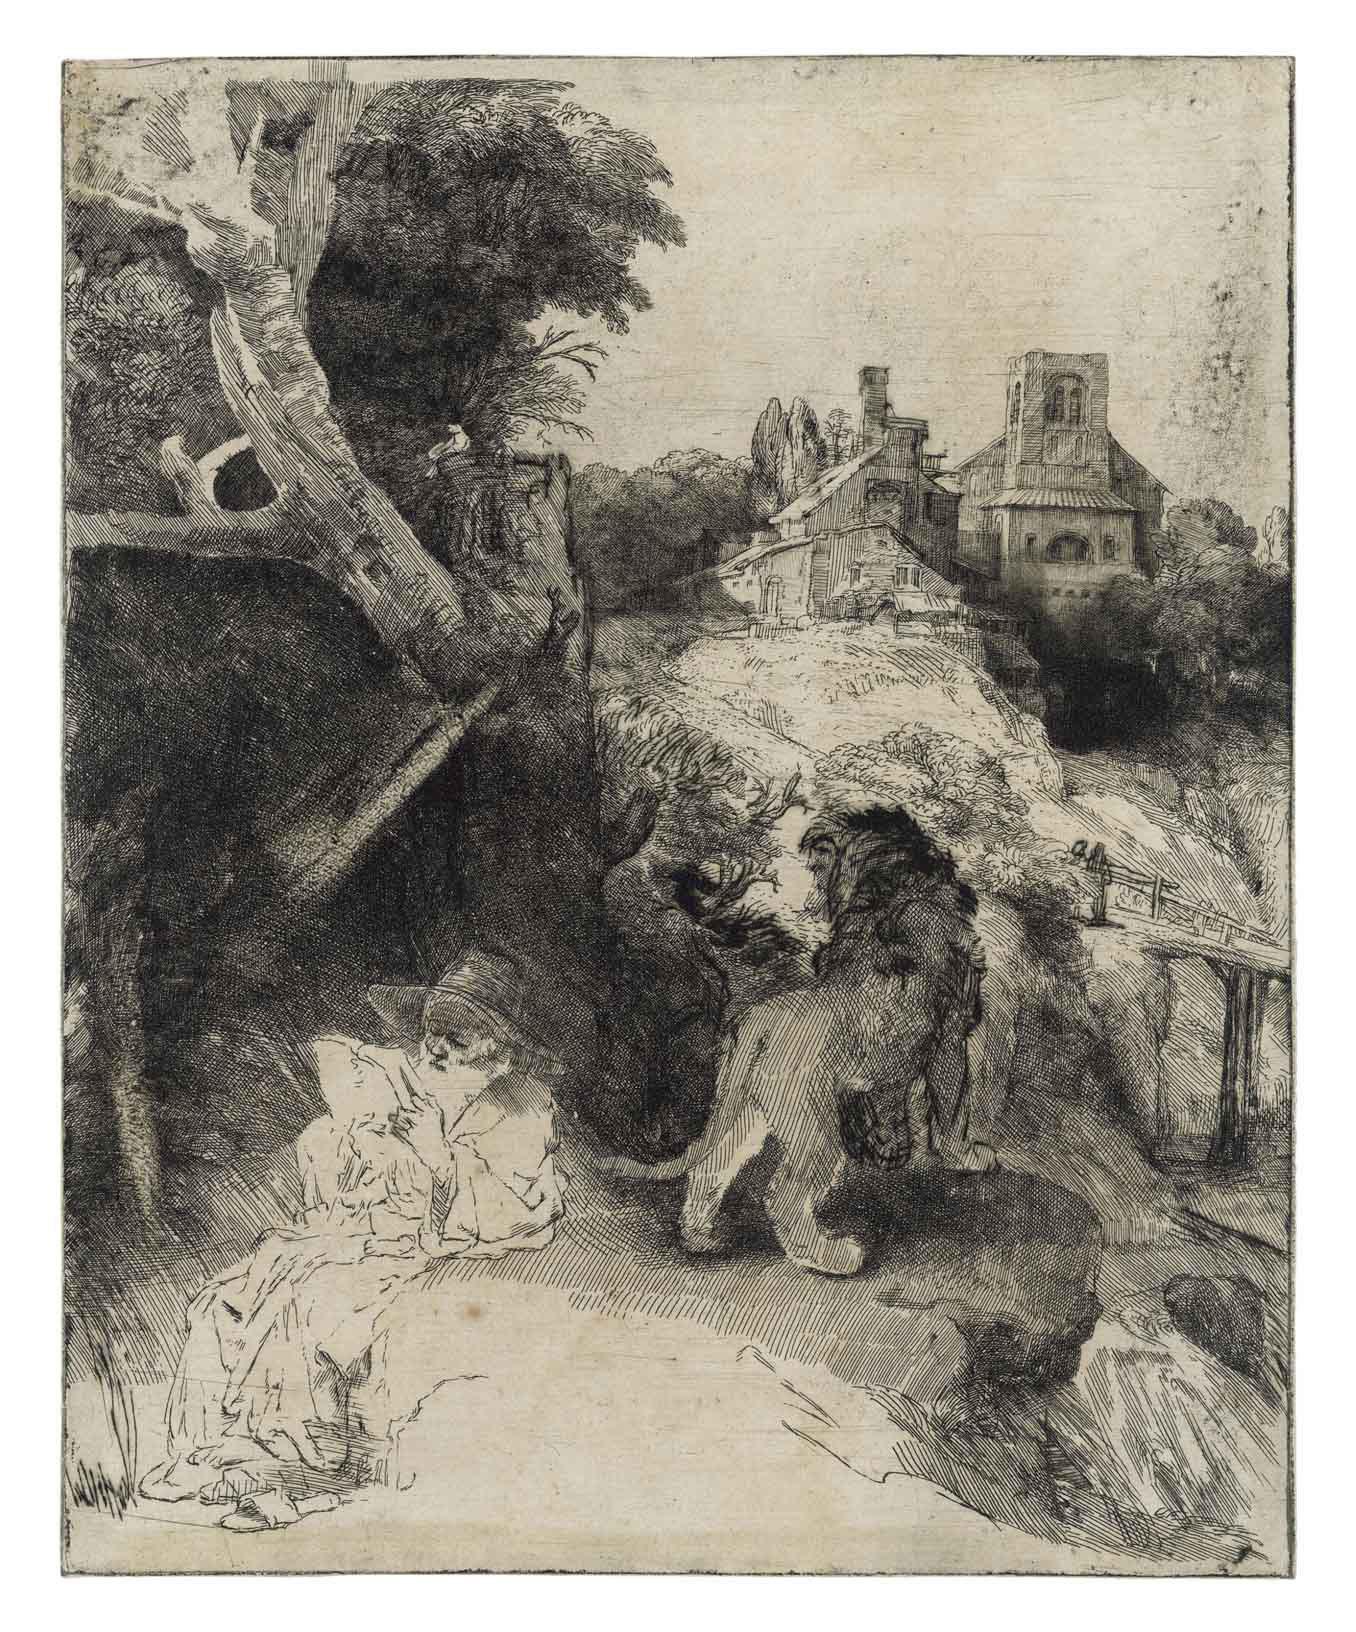 Saint Jerome reading in an Italianate Landscape (B., Holl. 104; H. 267)